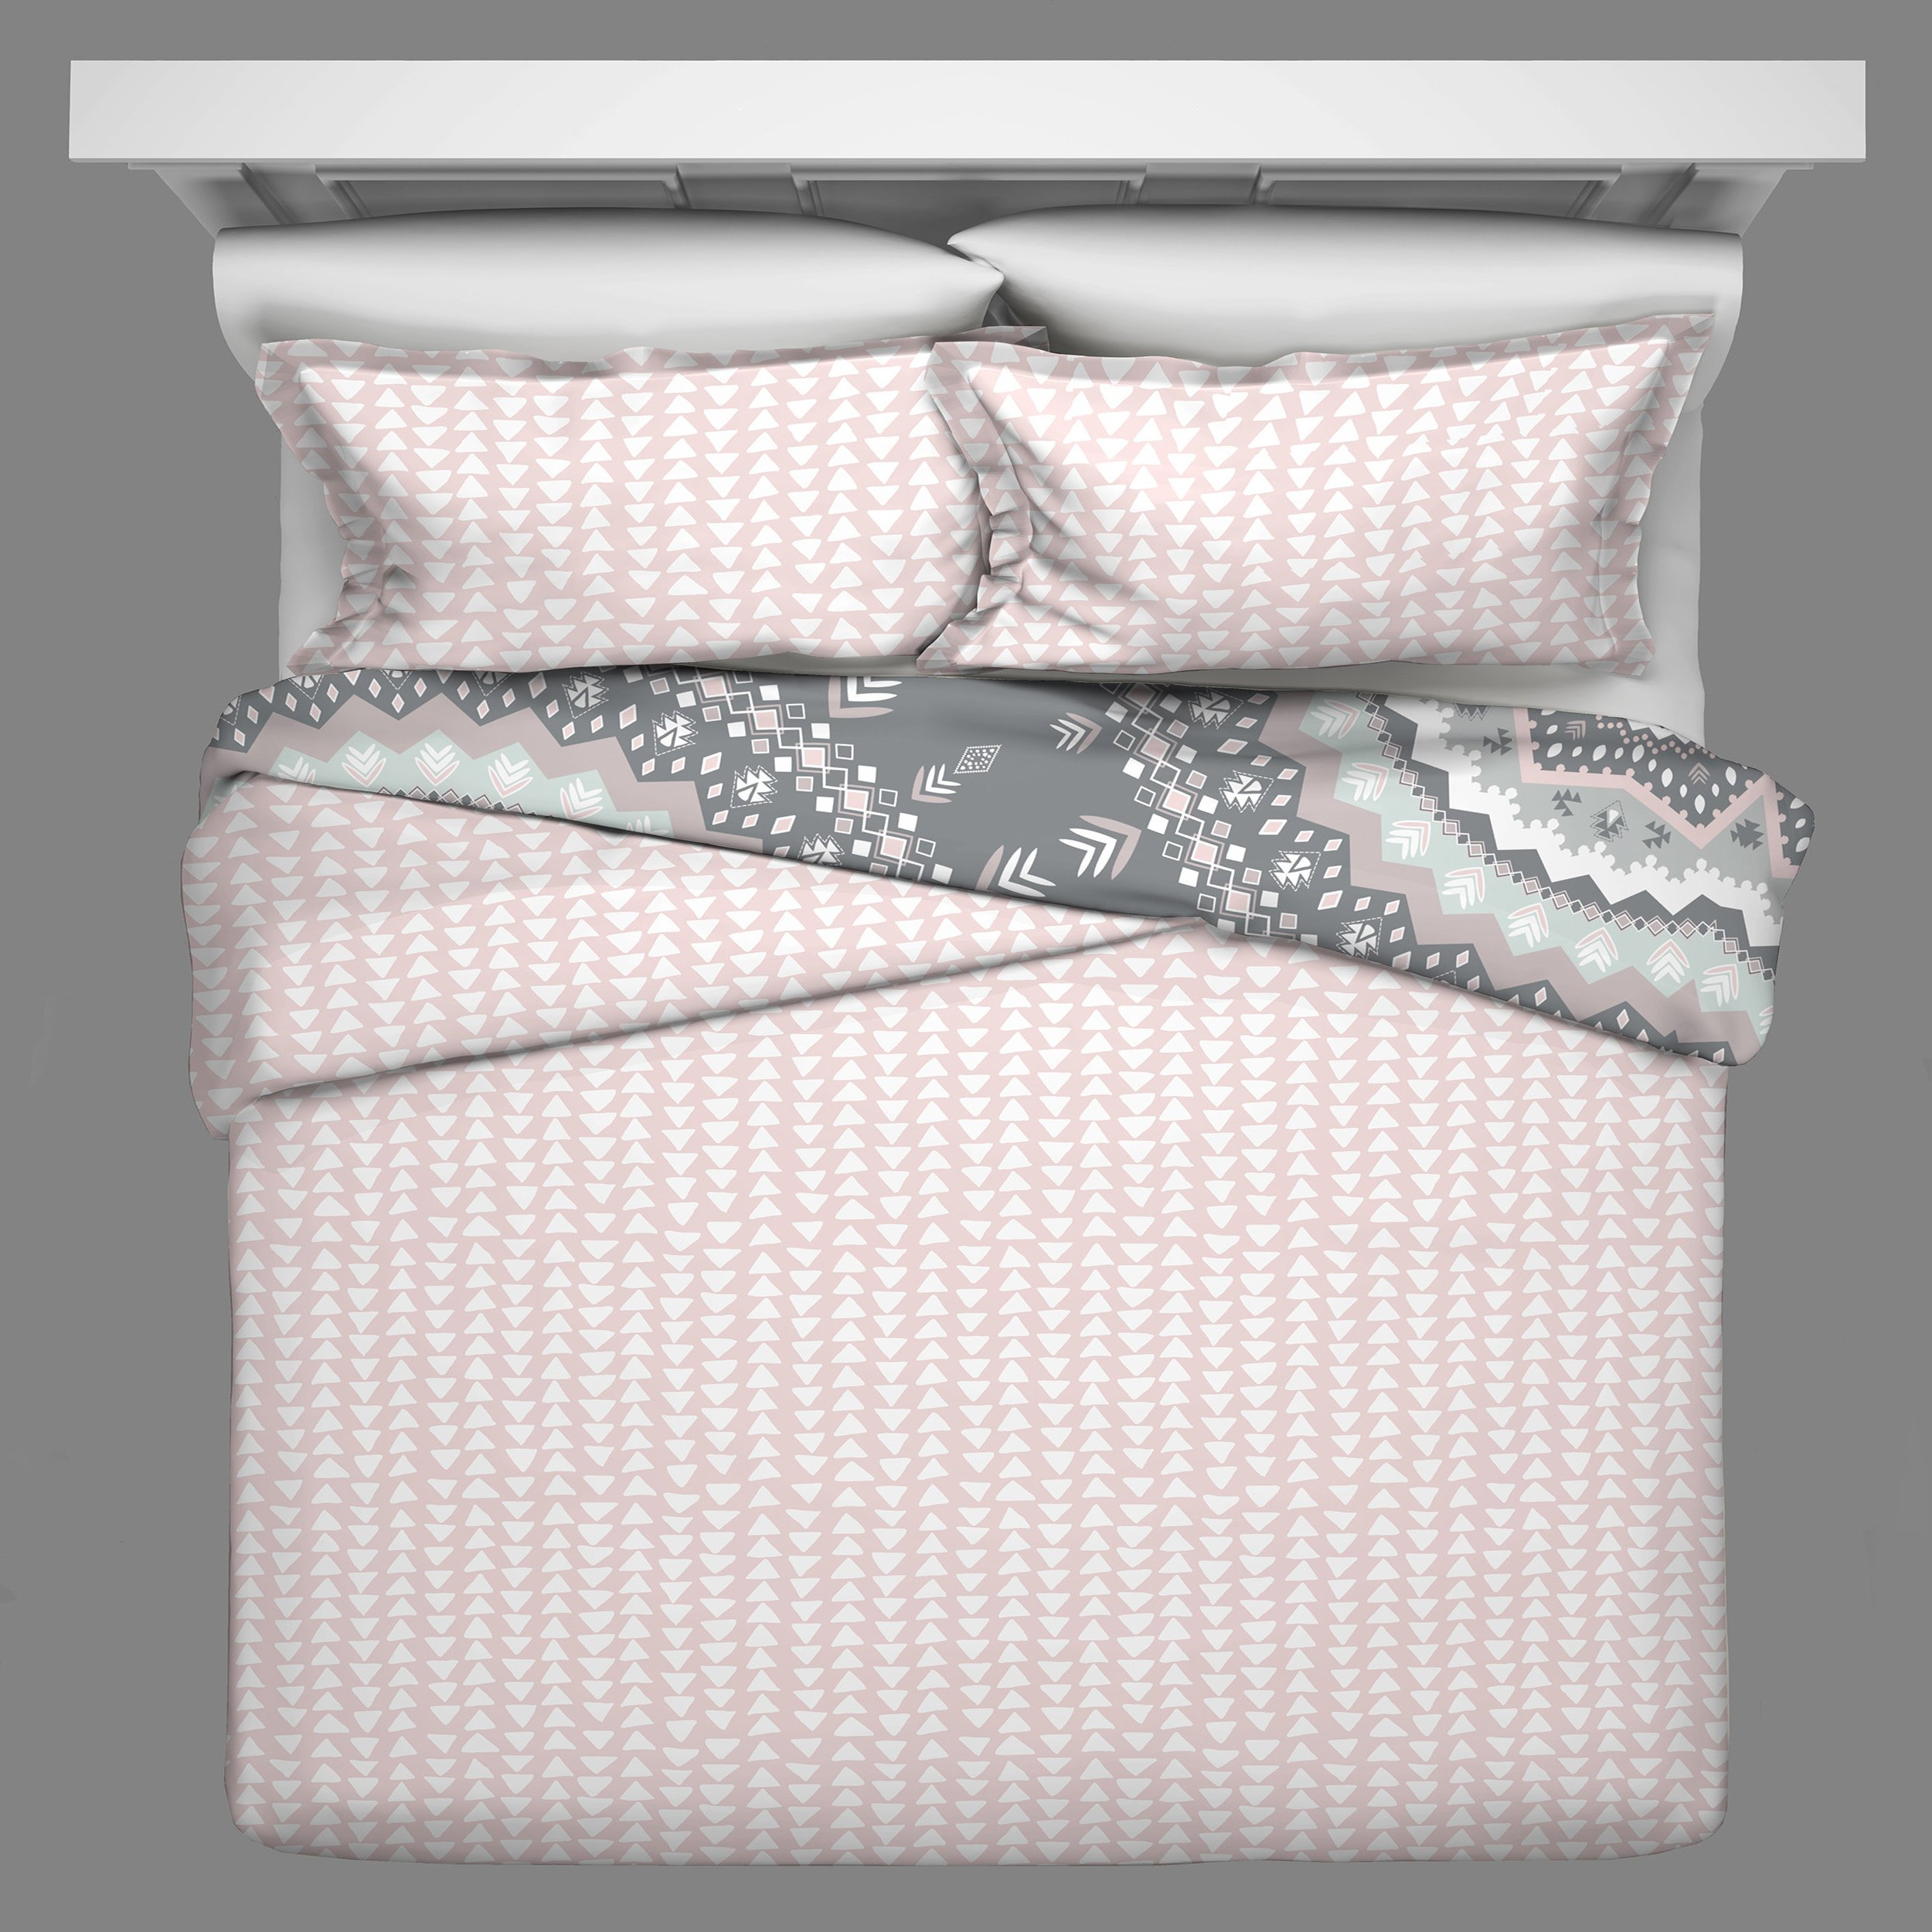 3 Piece Girls Light Pink White Grey Bohemian Mandala Comforter Full Queen Set, Girly All Over Tribal Southwest Arrow Bedding, Multi Boho Chic Tribe Southwestern Native American Themed Pattern, Gray